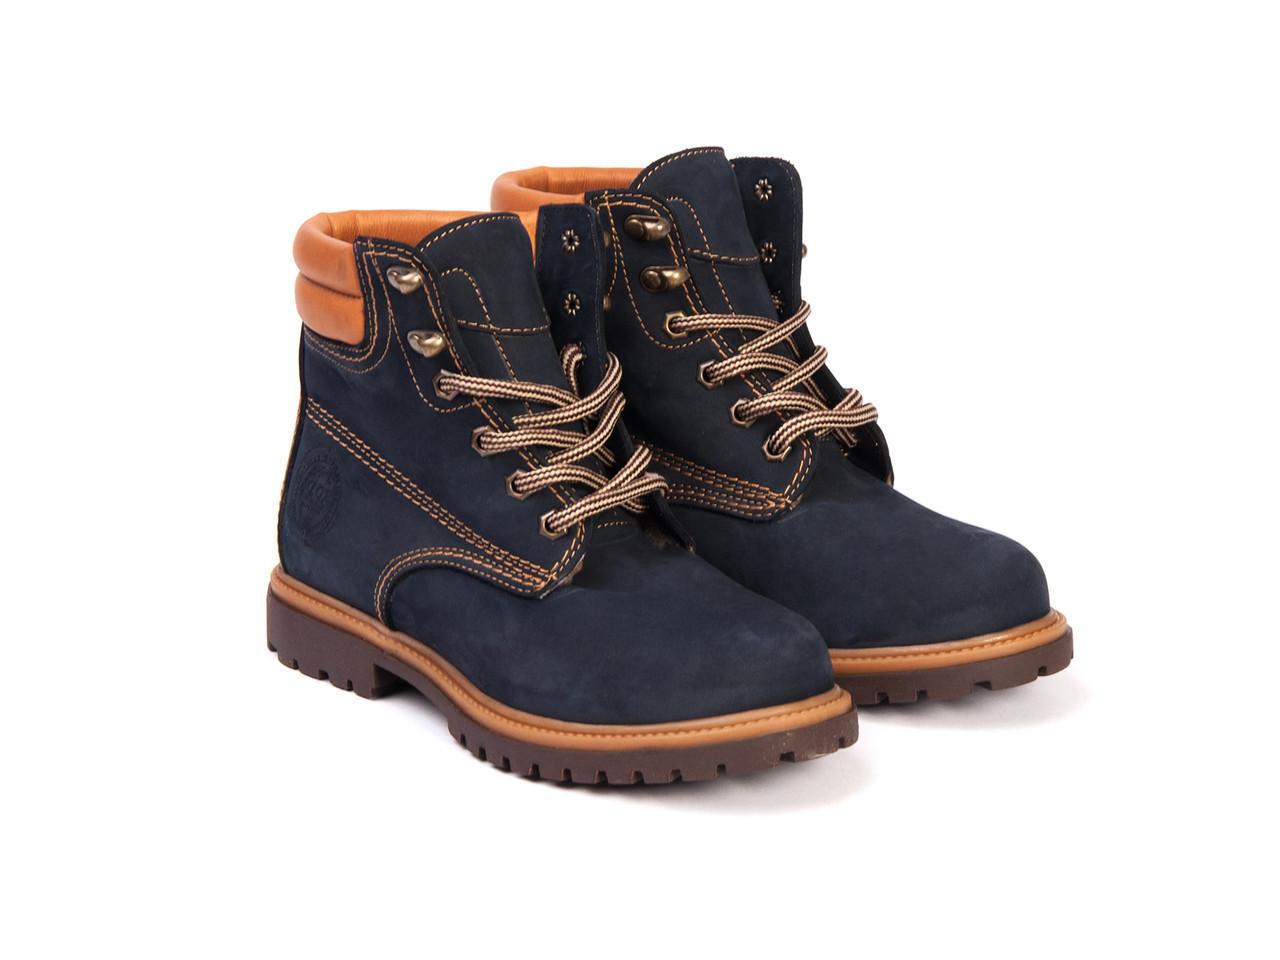 Ботинки Etor 2852-4310-2298 40 синие